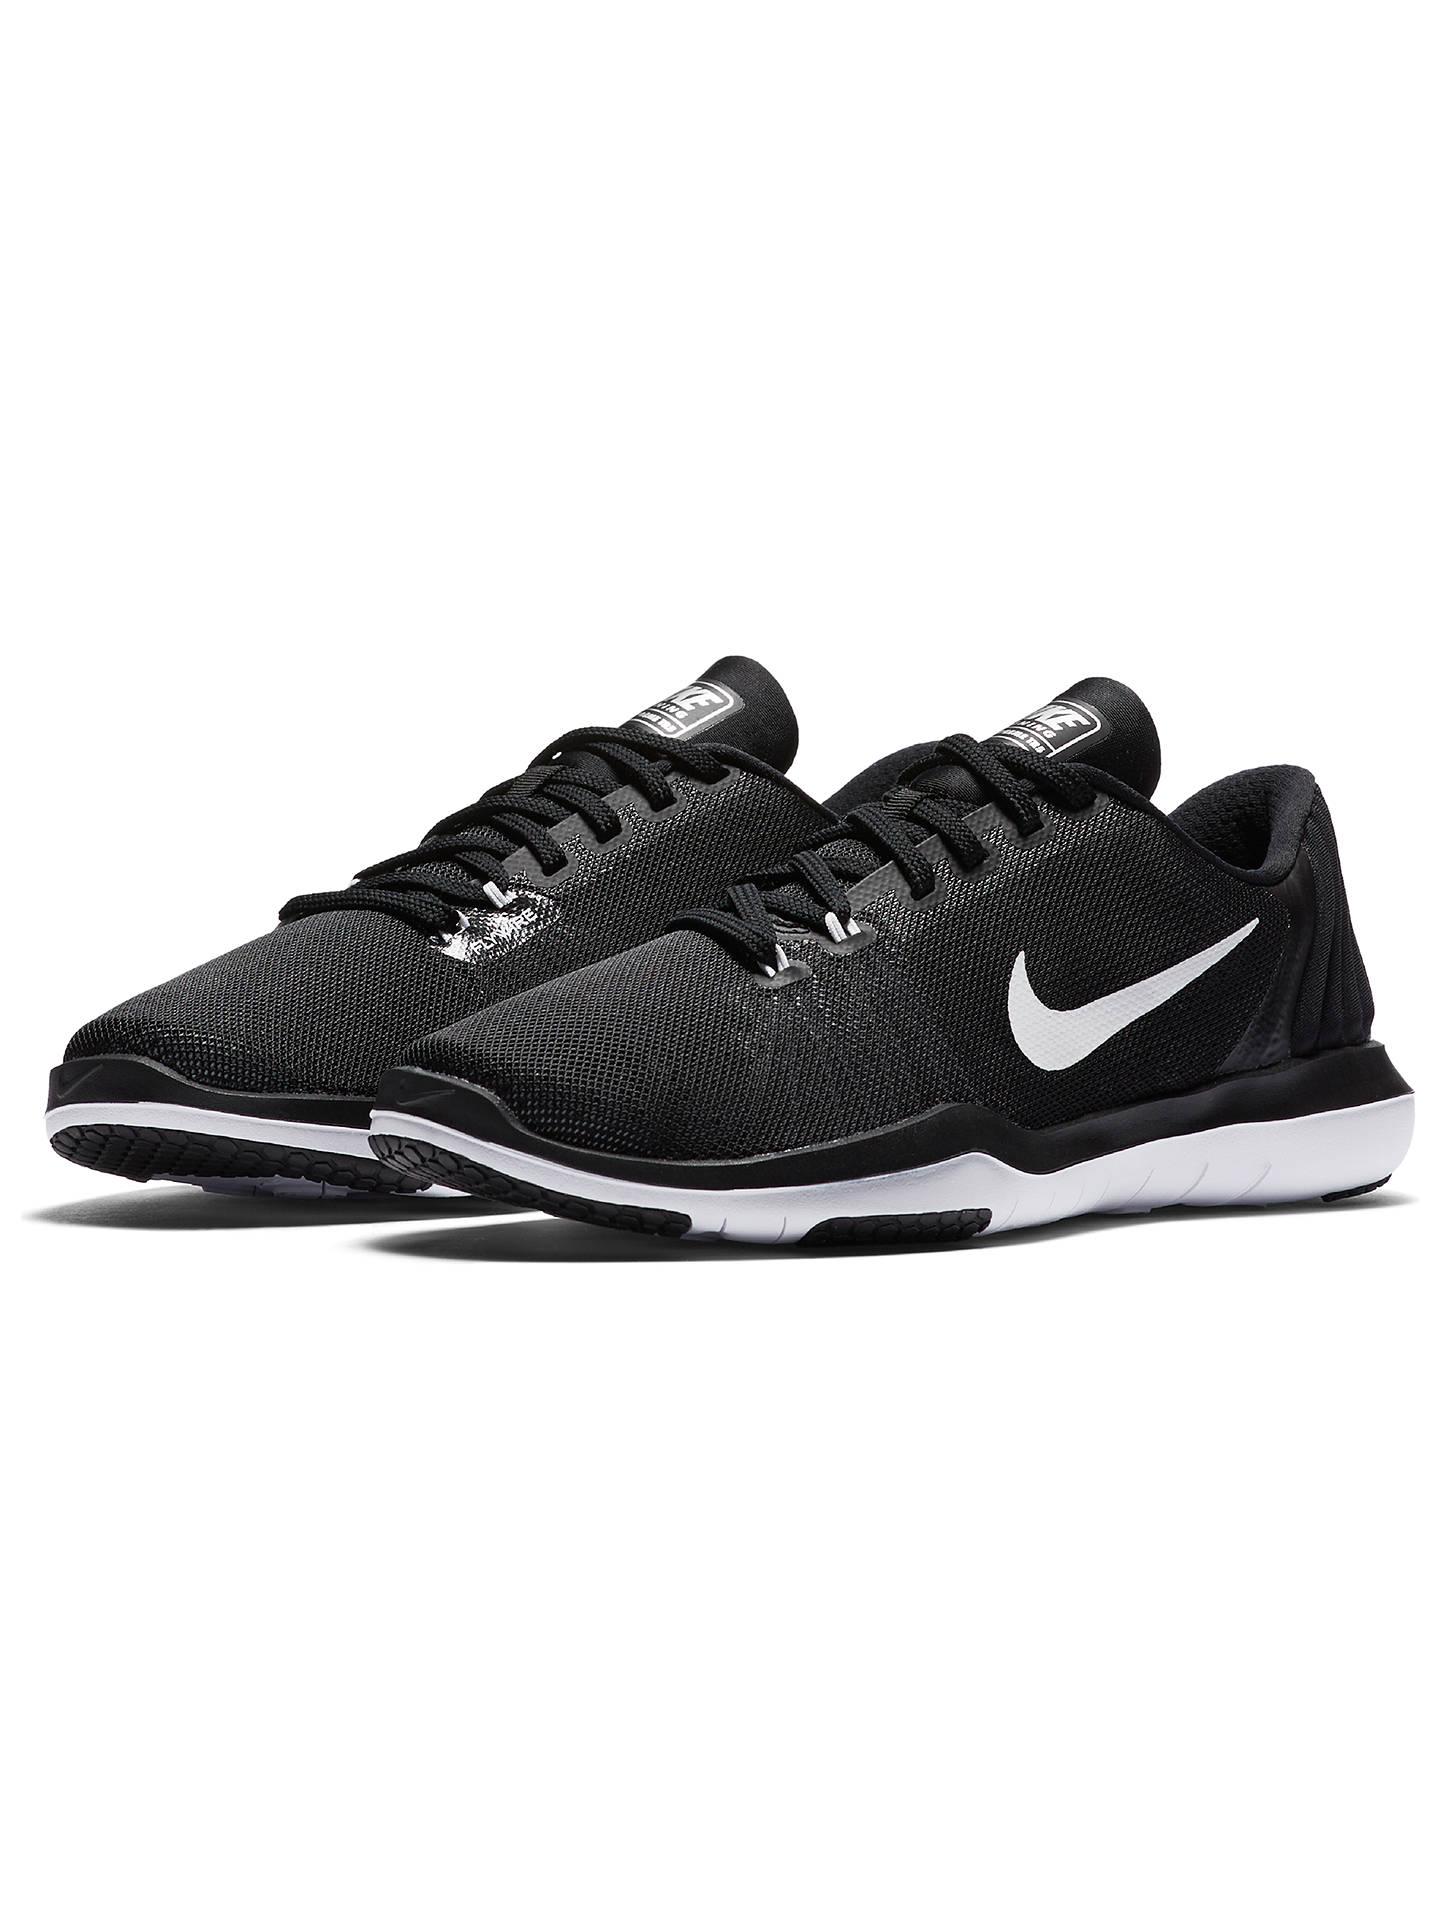 2cac2879de75 ... Buy Nike Flex Supreme TR 5 Women s Cross Trainers